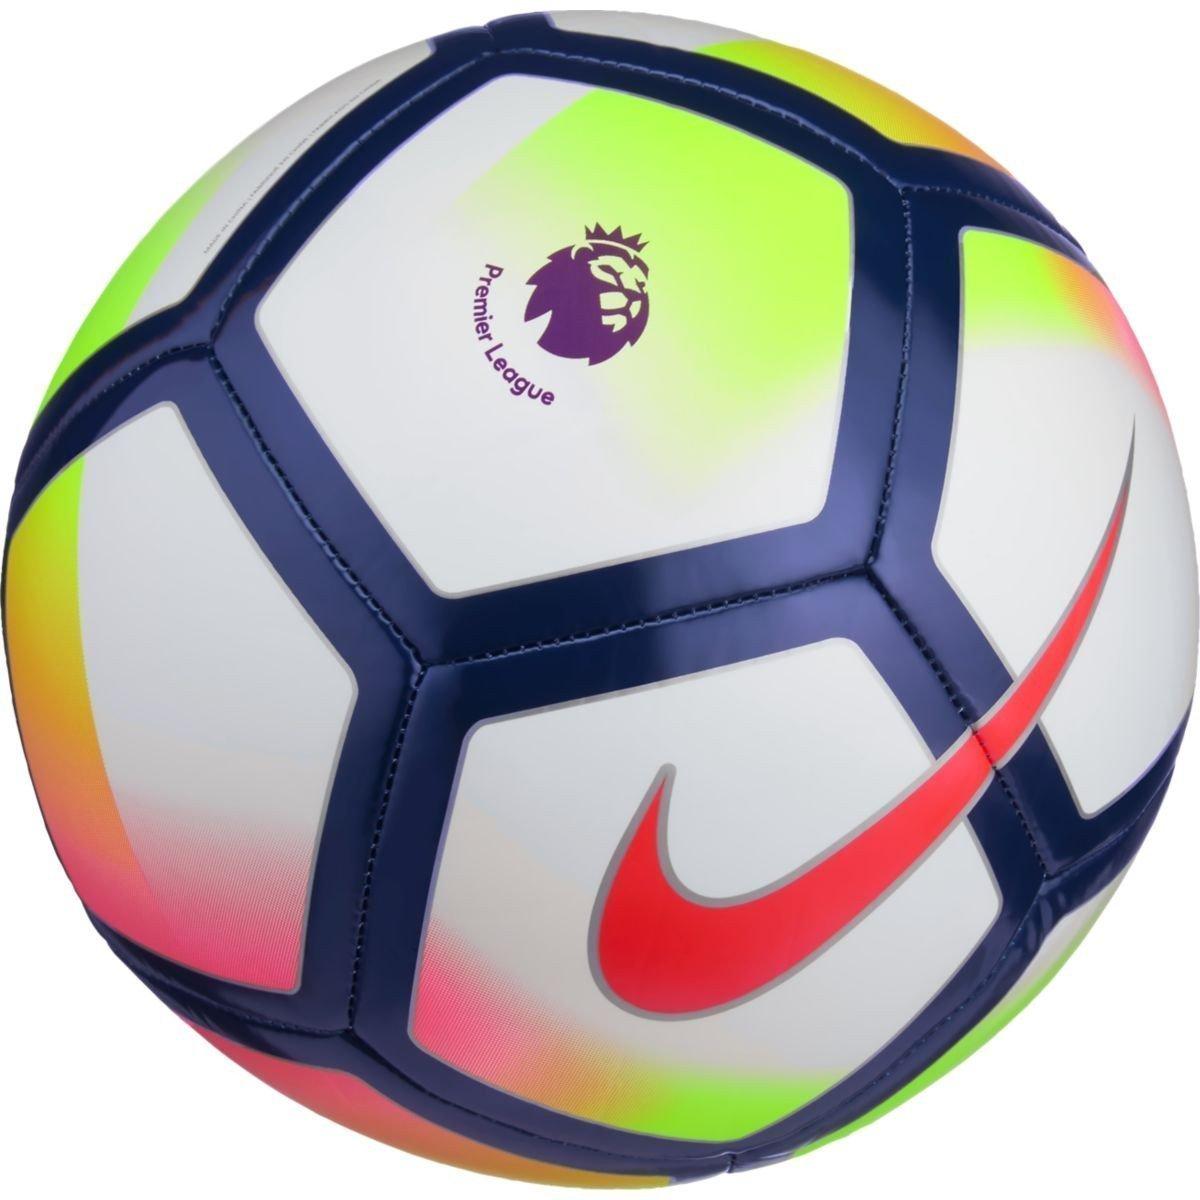 Ballon de foot Nike Premier League 2017-2018